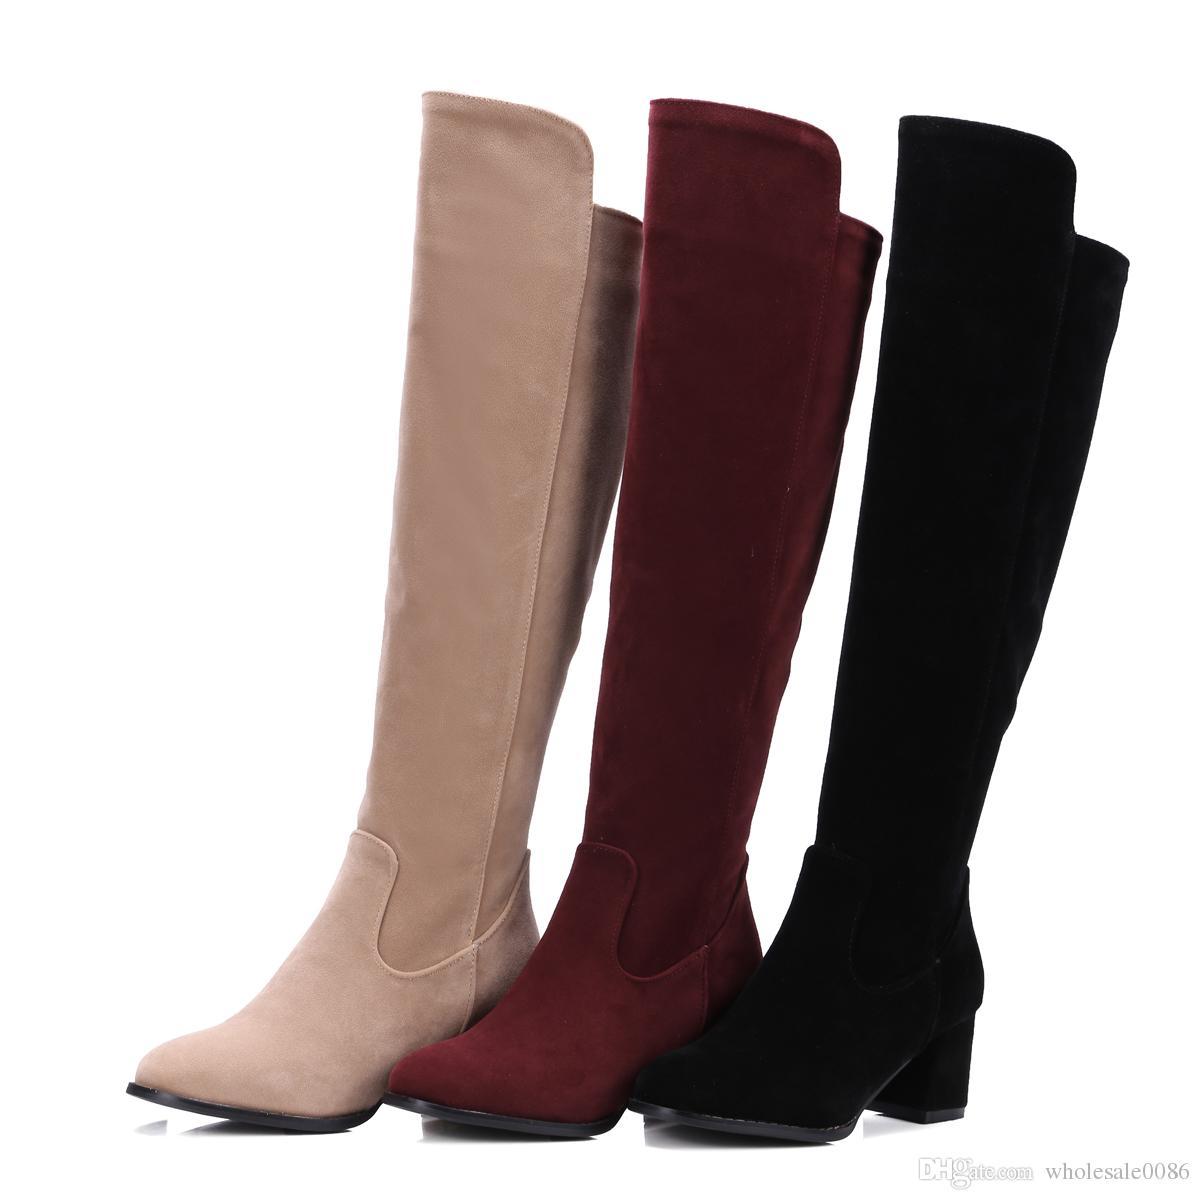 b0d3a782c105 New Hot Fashion Women's Faux Suede Shoes Block Heel Zip Round Toe ...